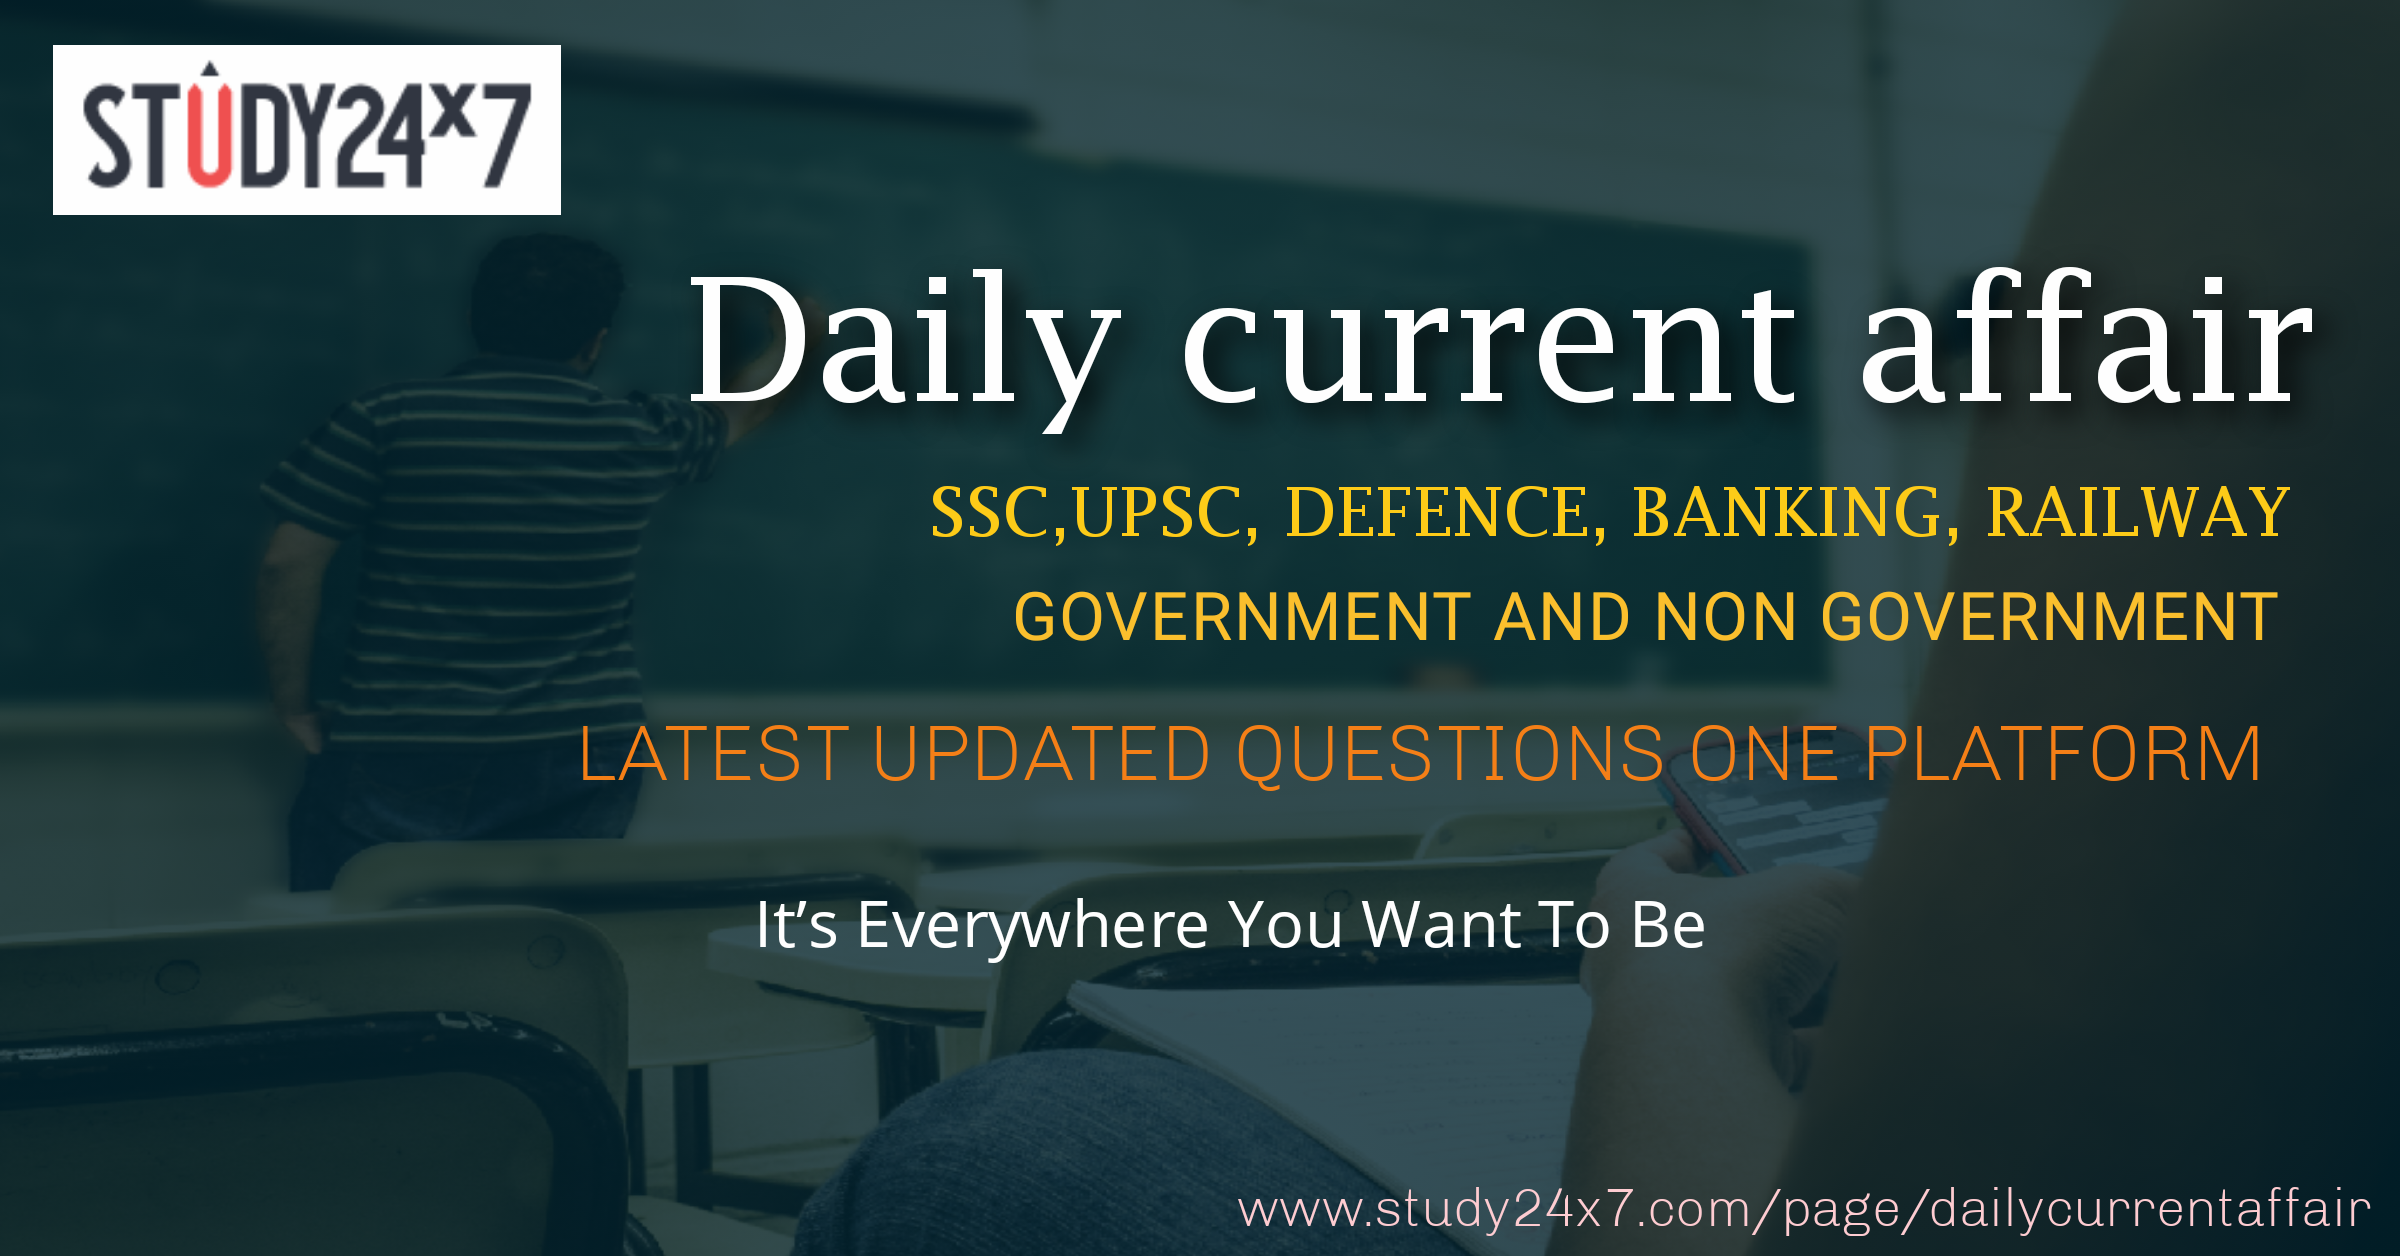 https://www.study24x7.com/article/959/current-affairs...